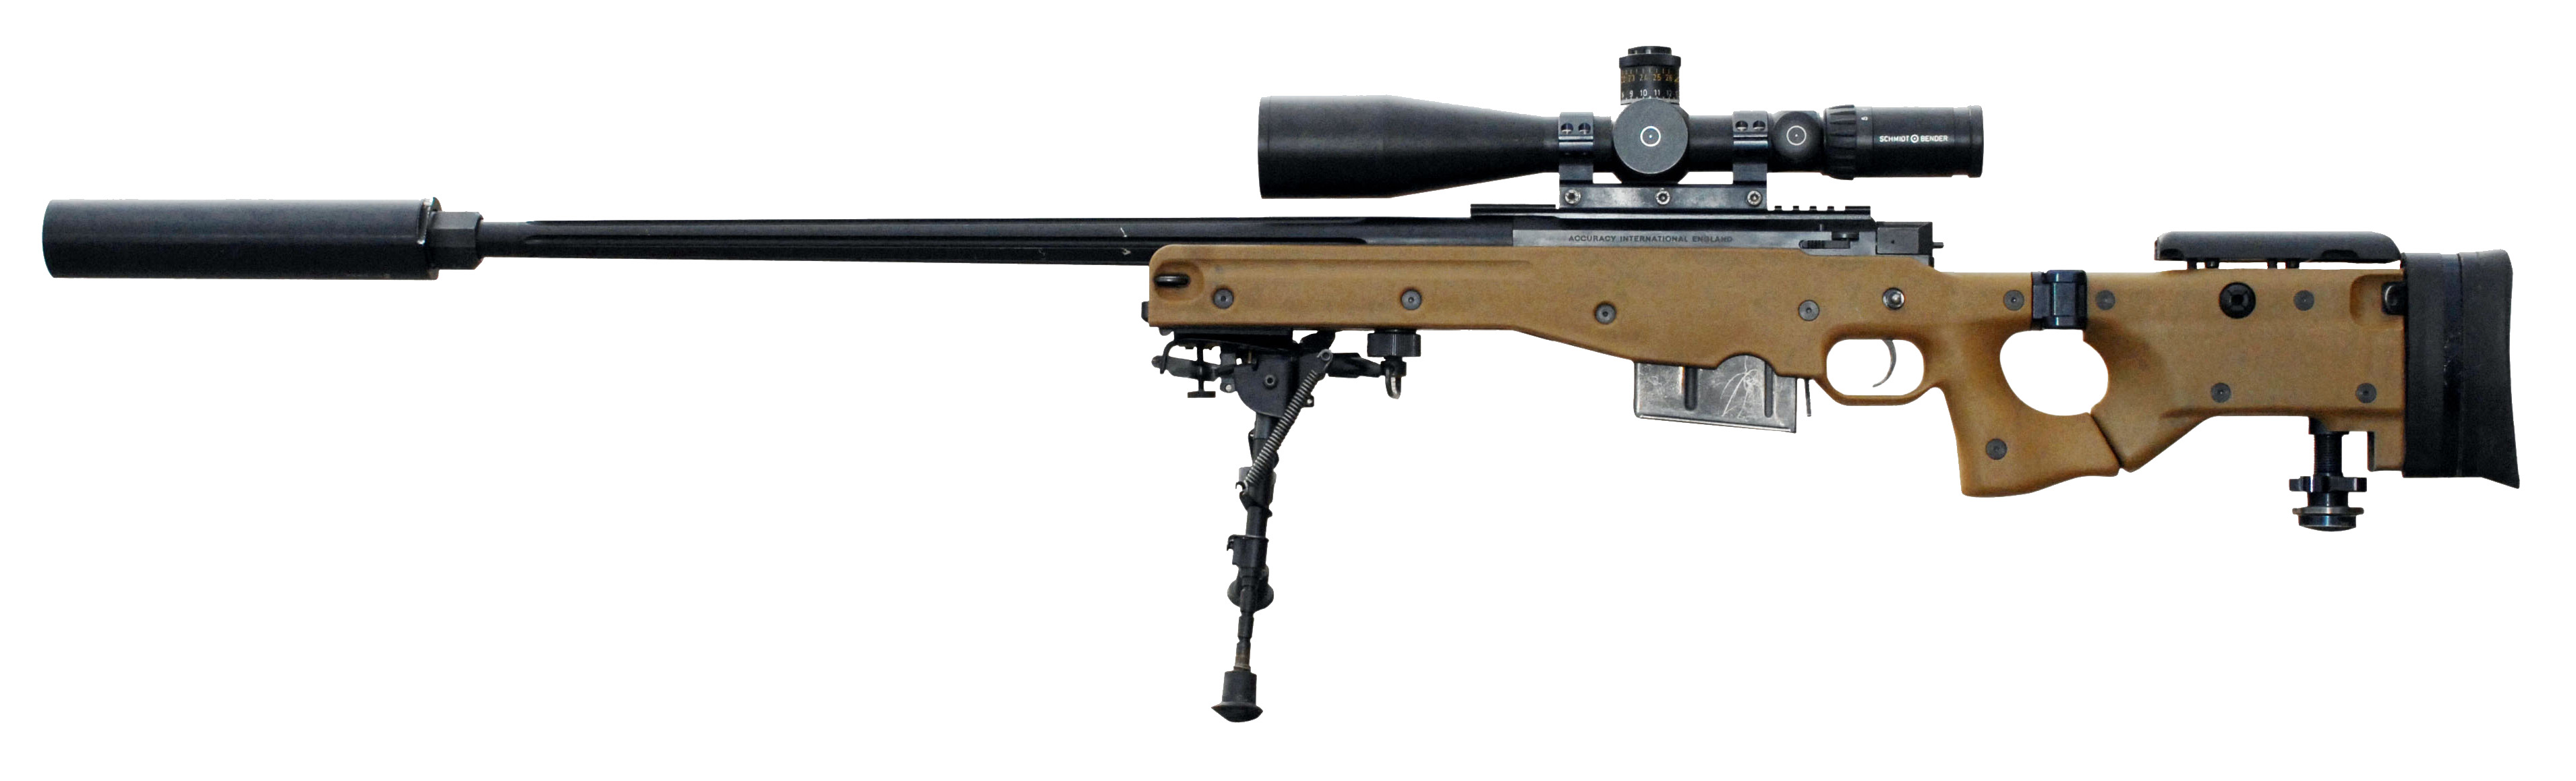 Long Range Rifle Range West Palm Beach Fl